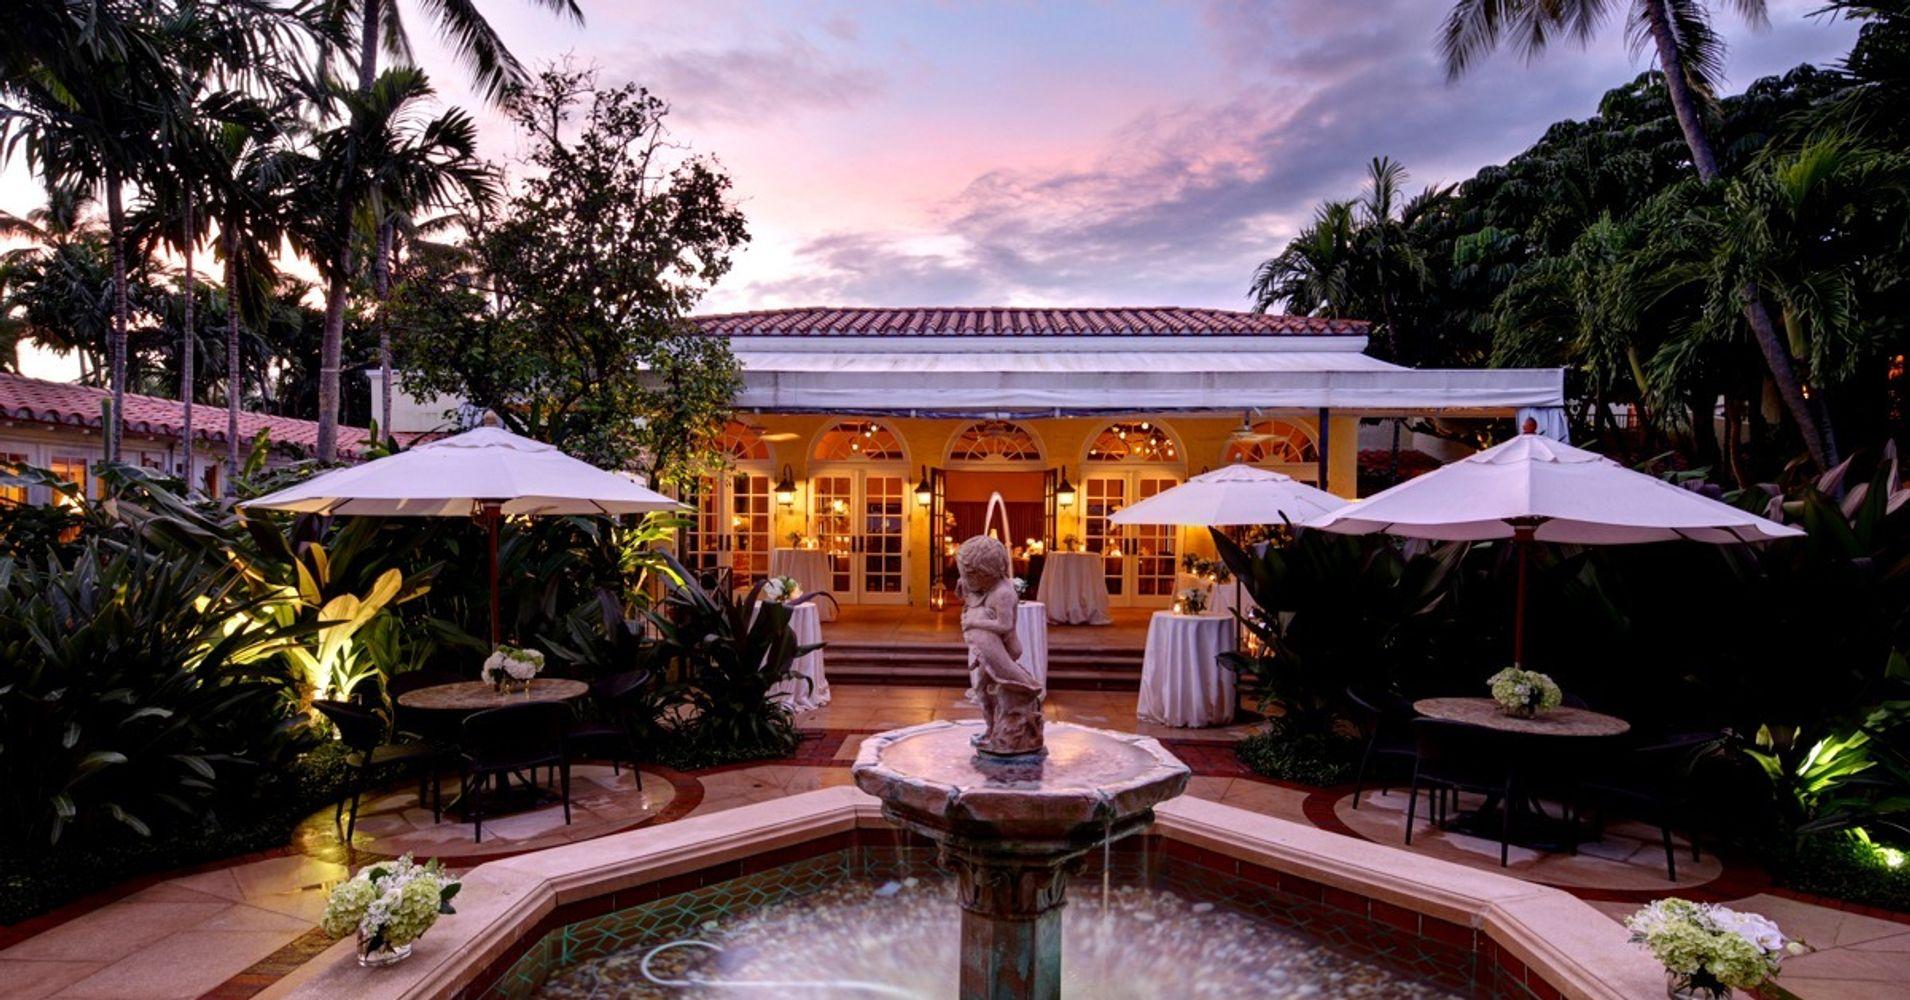 A Royal Getaway The Brazilian Court Palm Beach Florida Review Huffpost